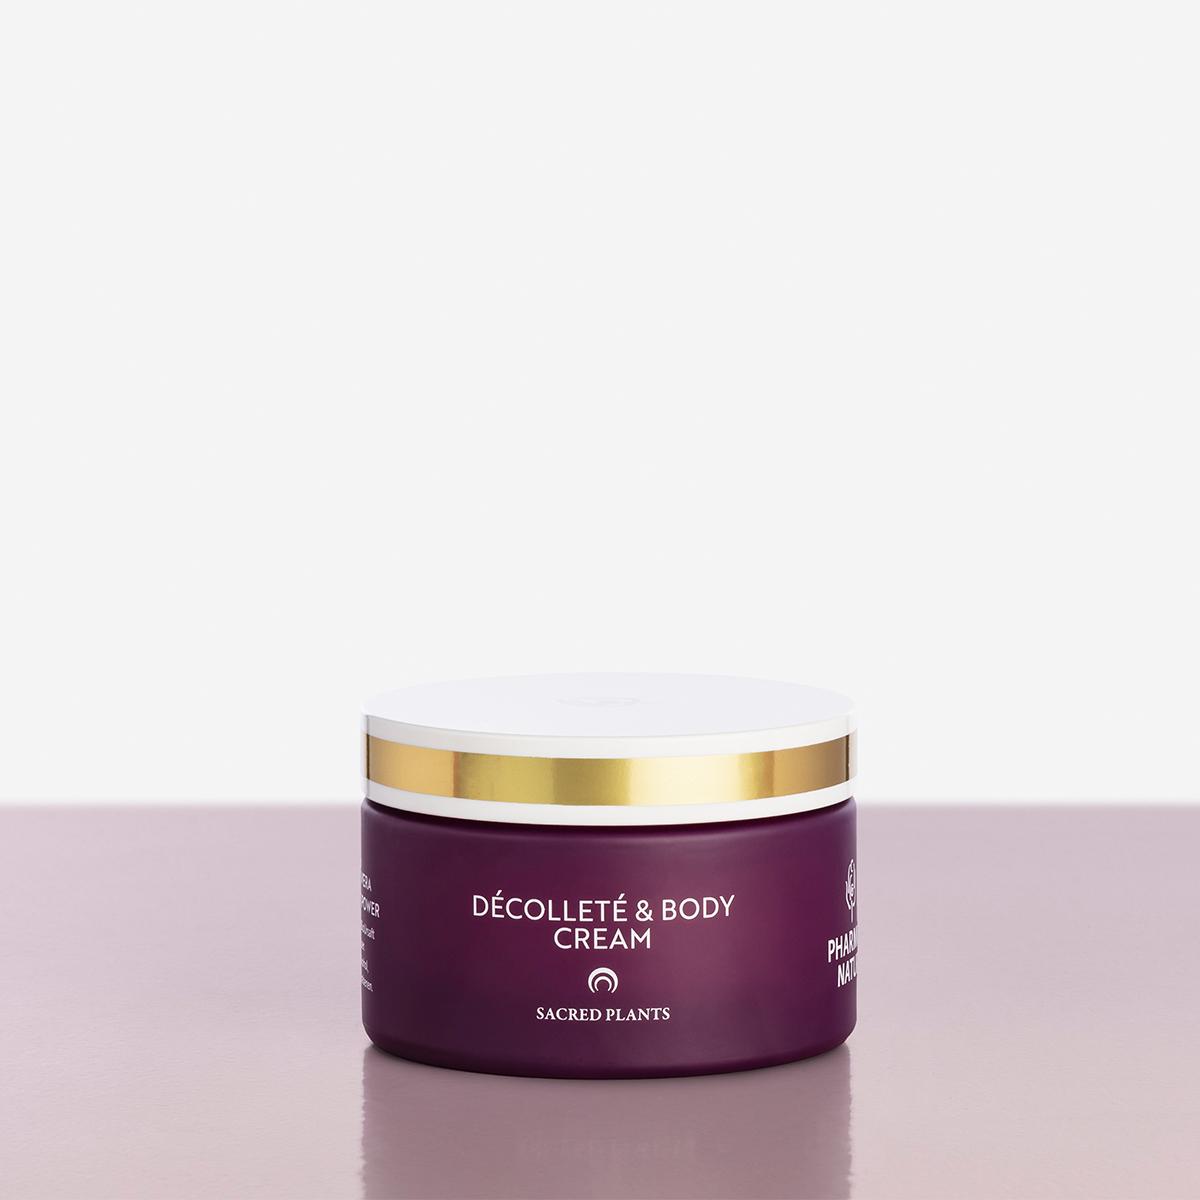 lilane Decollete and Body Cream Produktbild